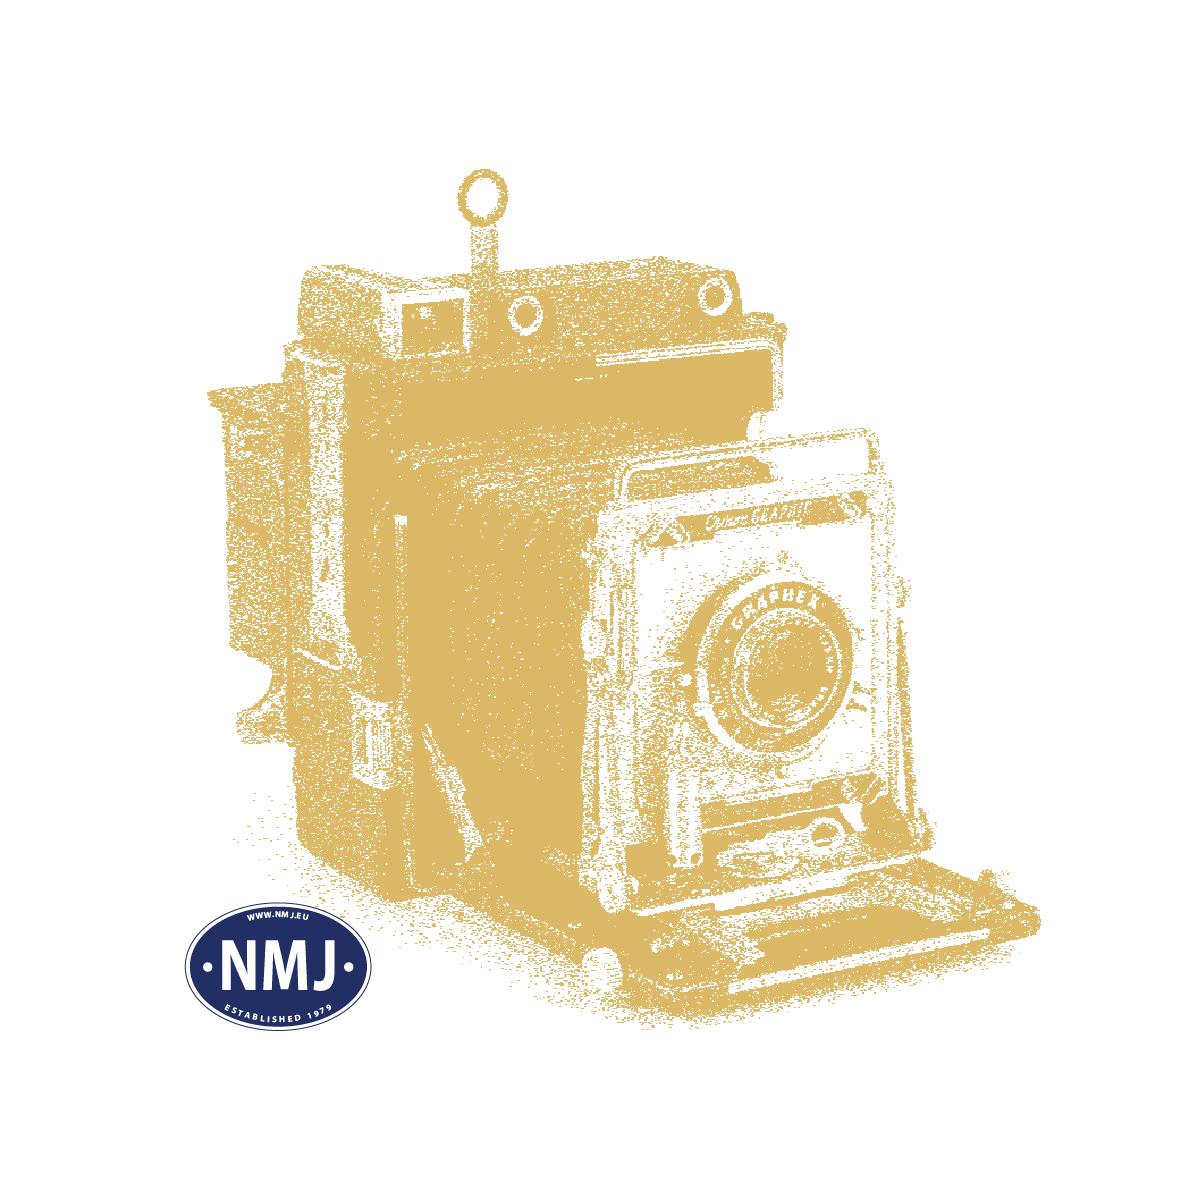 ESU54671 - Powerpack Mini for Lokpilot/Loksound V4